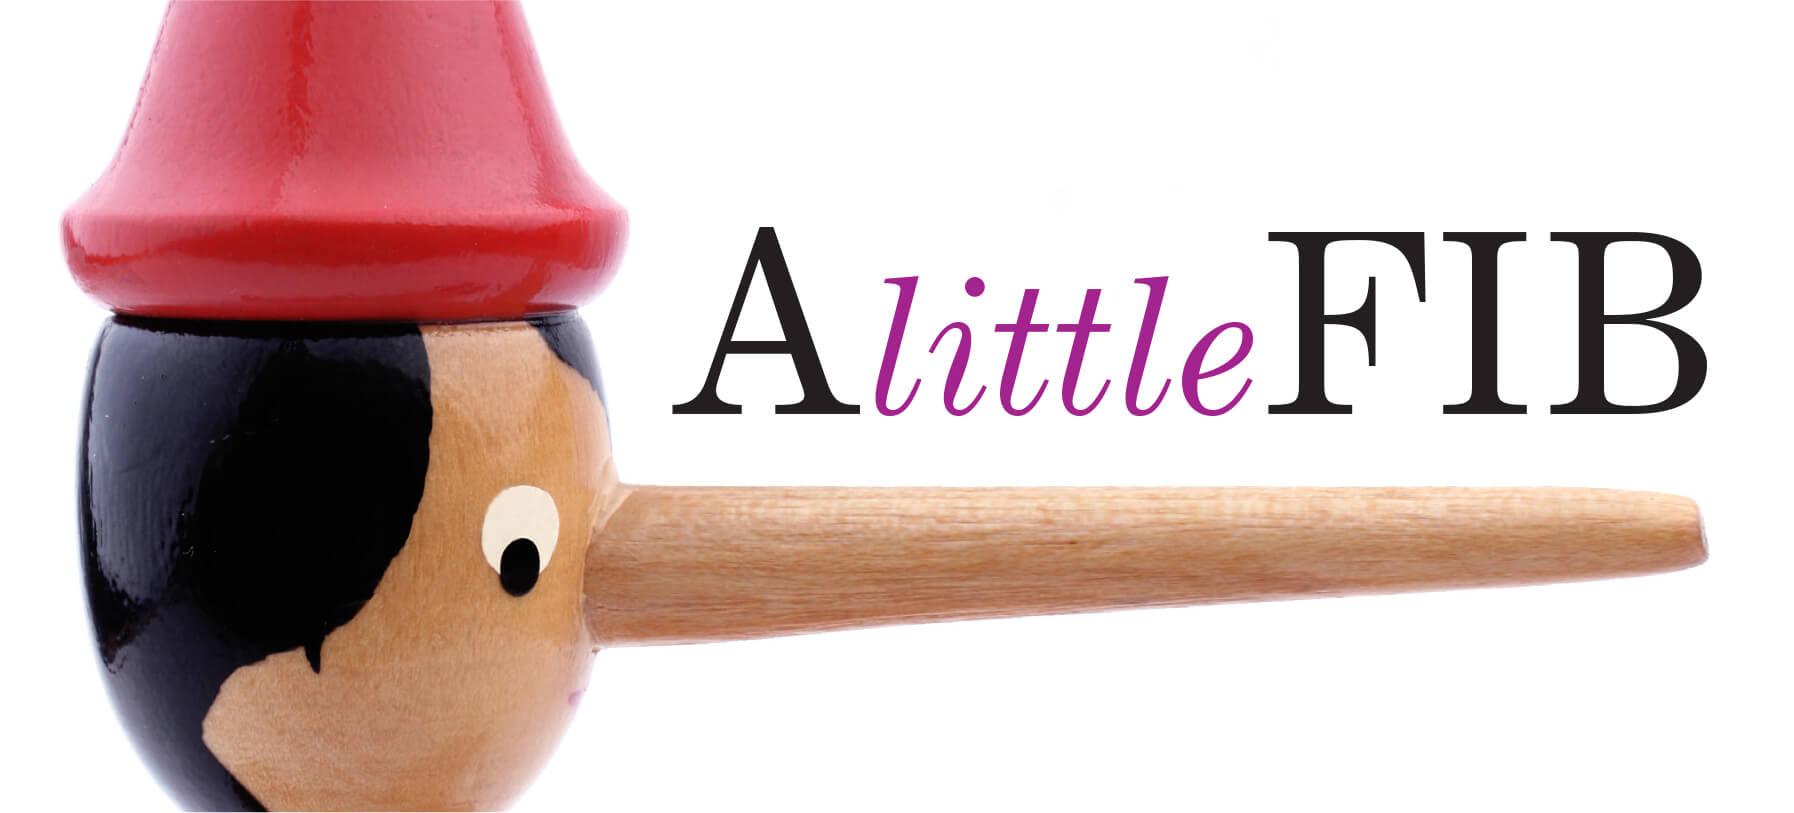 a-little-fib